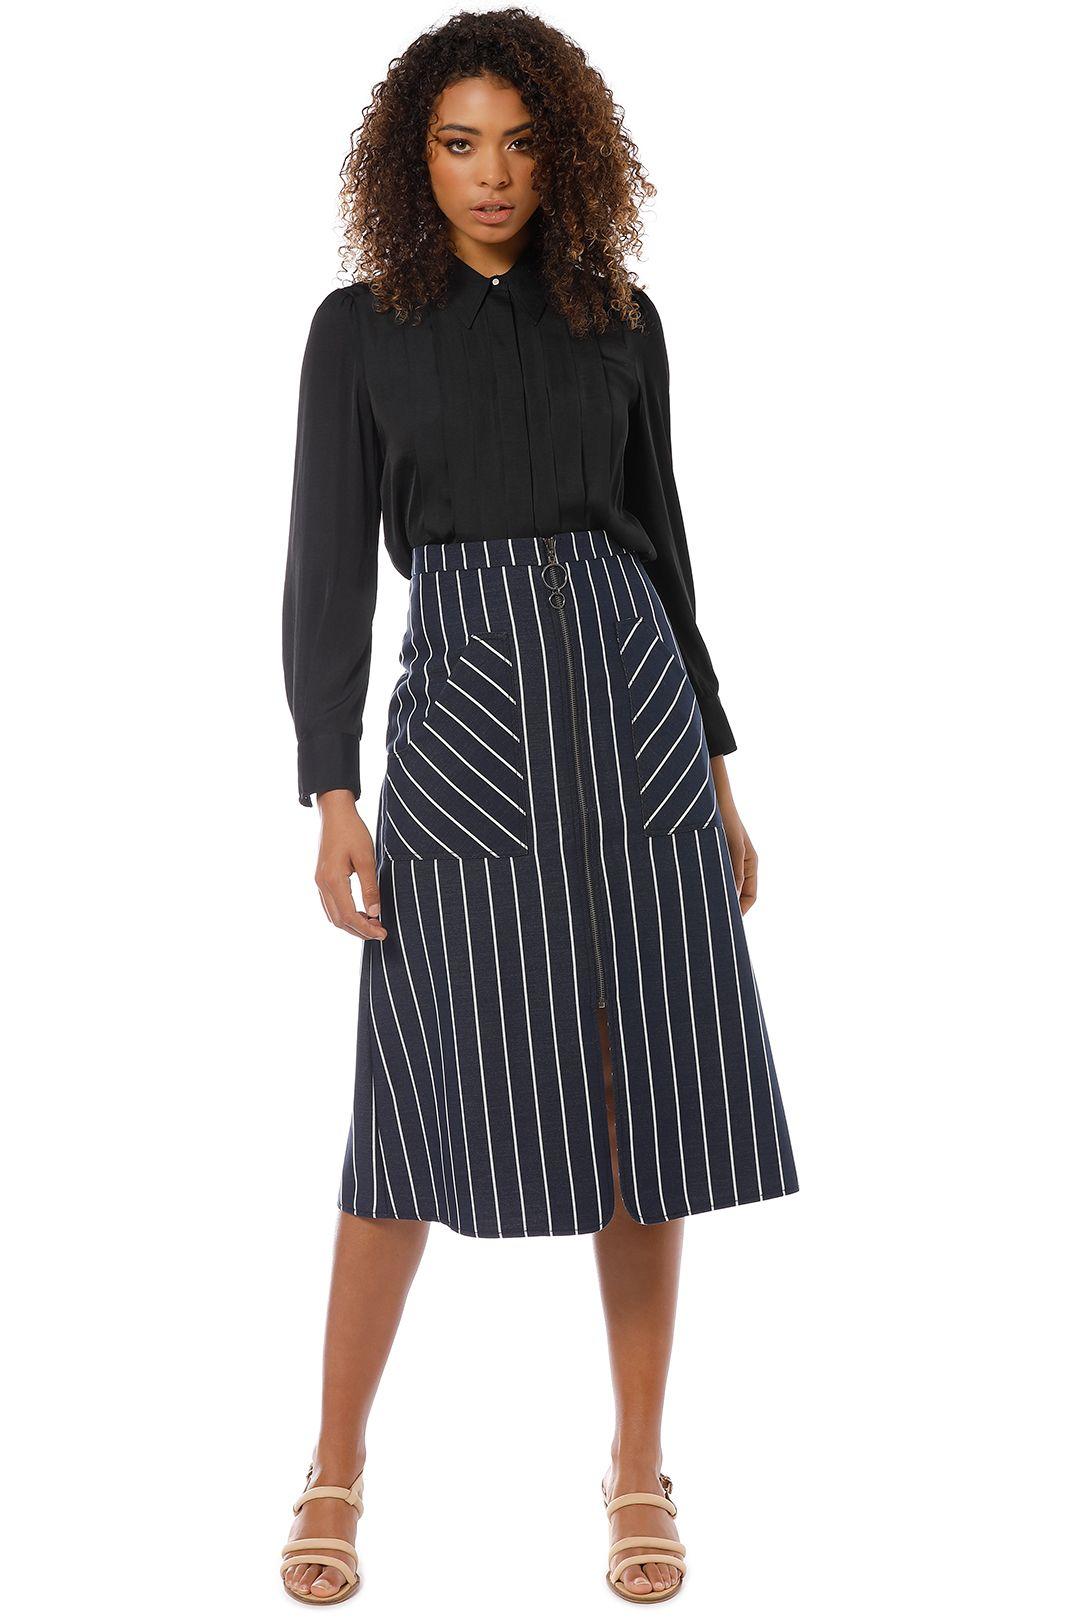 Veronika Maine - Dull Satin Pleated Shirt - Black - Front